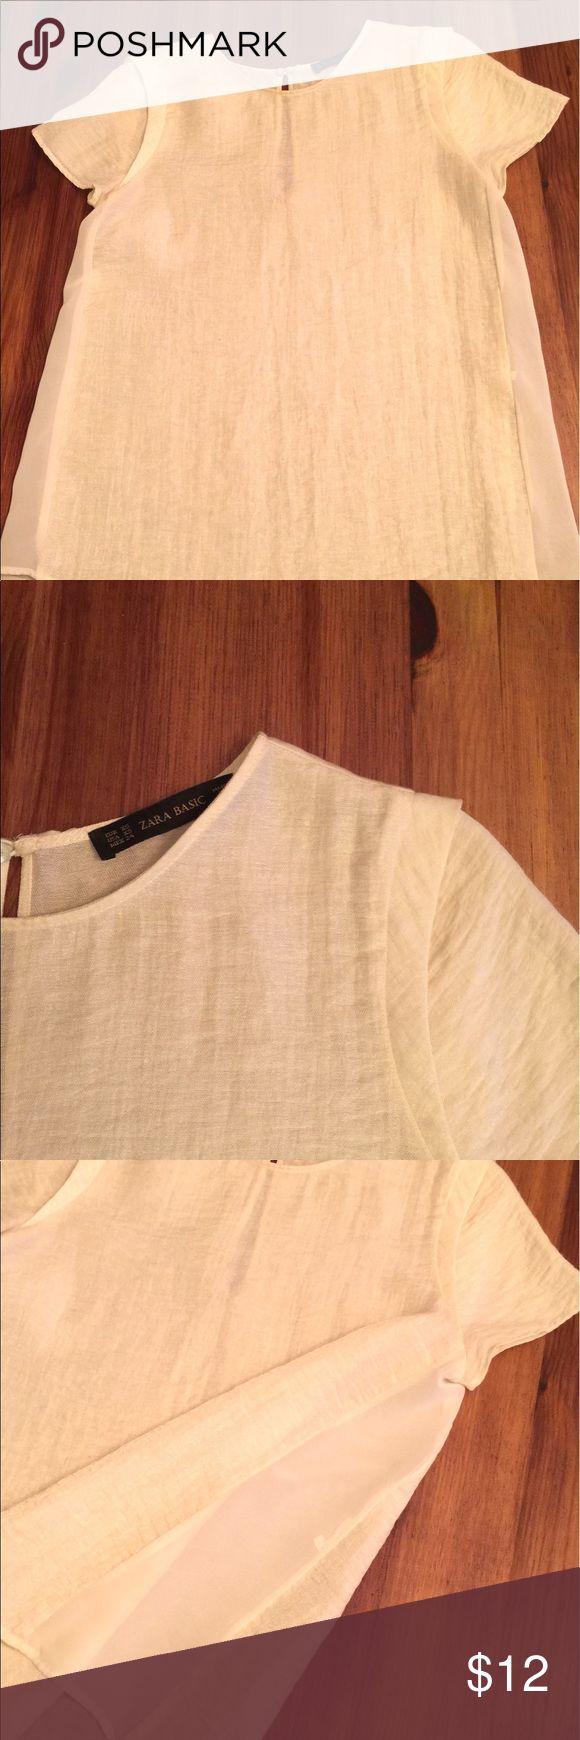 Zara Basic women's blouse Zara Basic women's blouse , size XS. Color light beige. Necklace is not included Tops Blouses